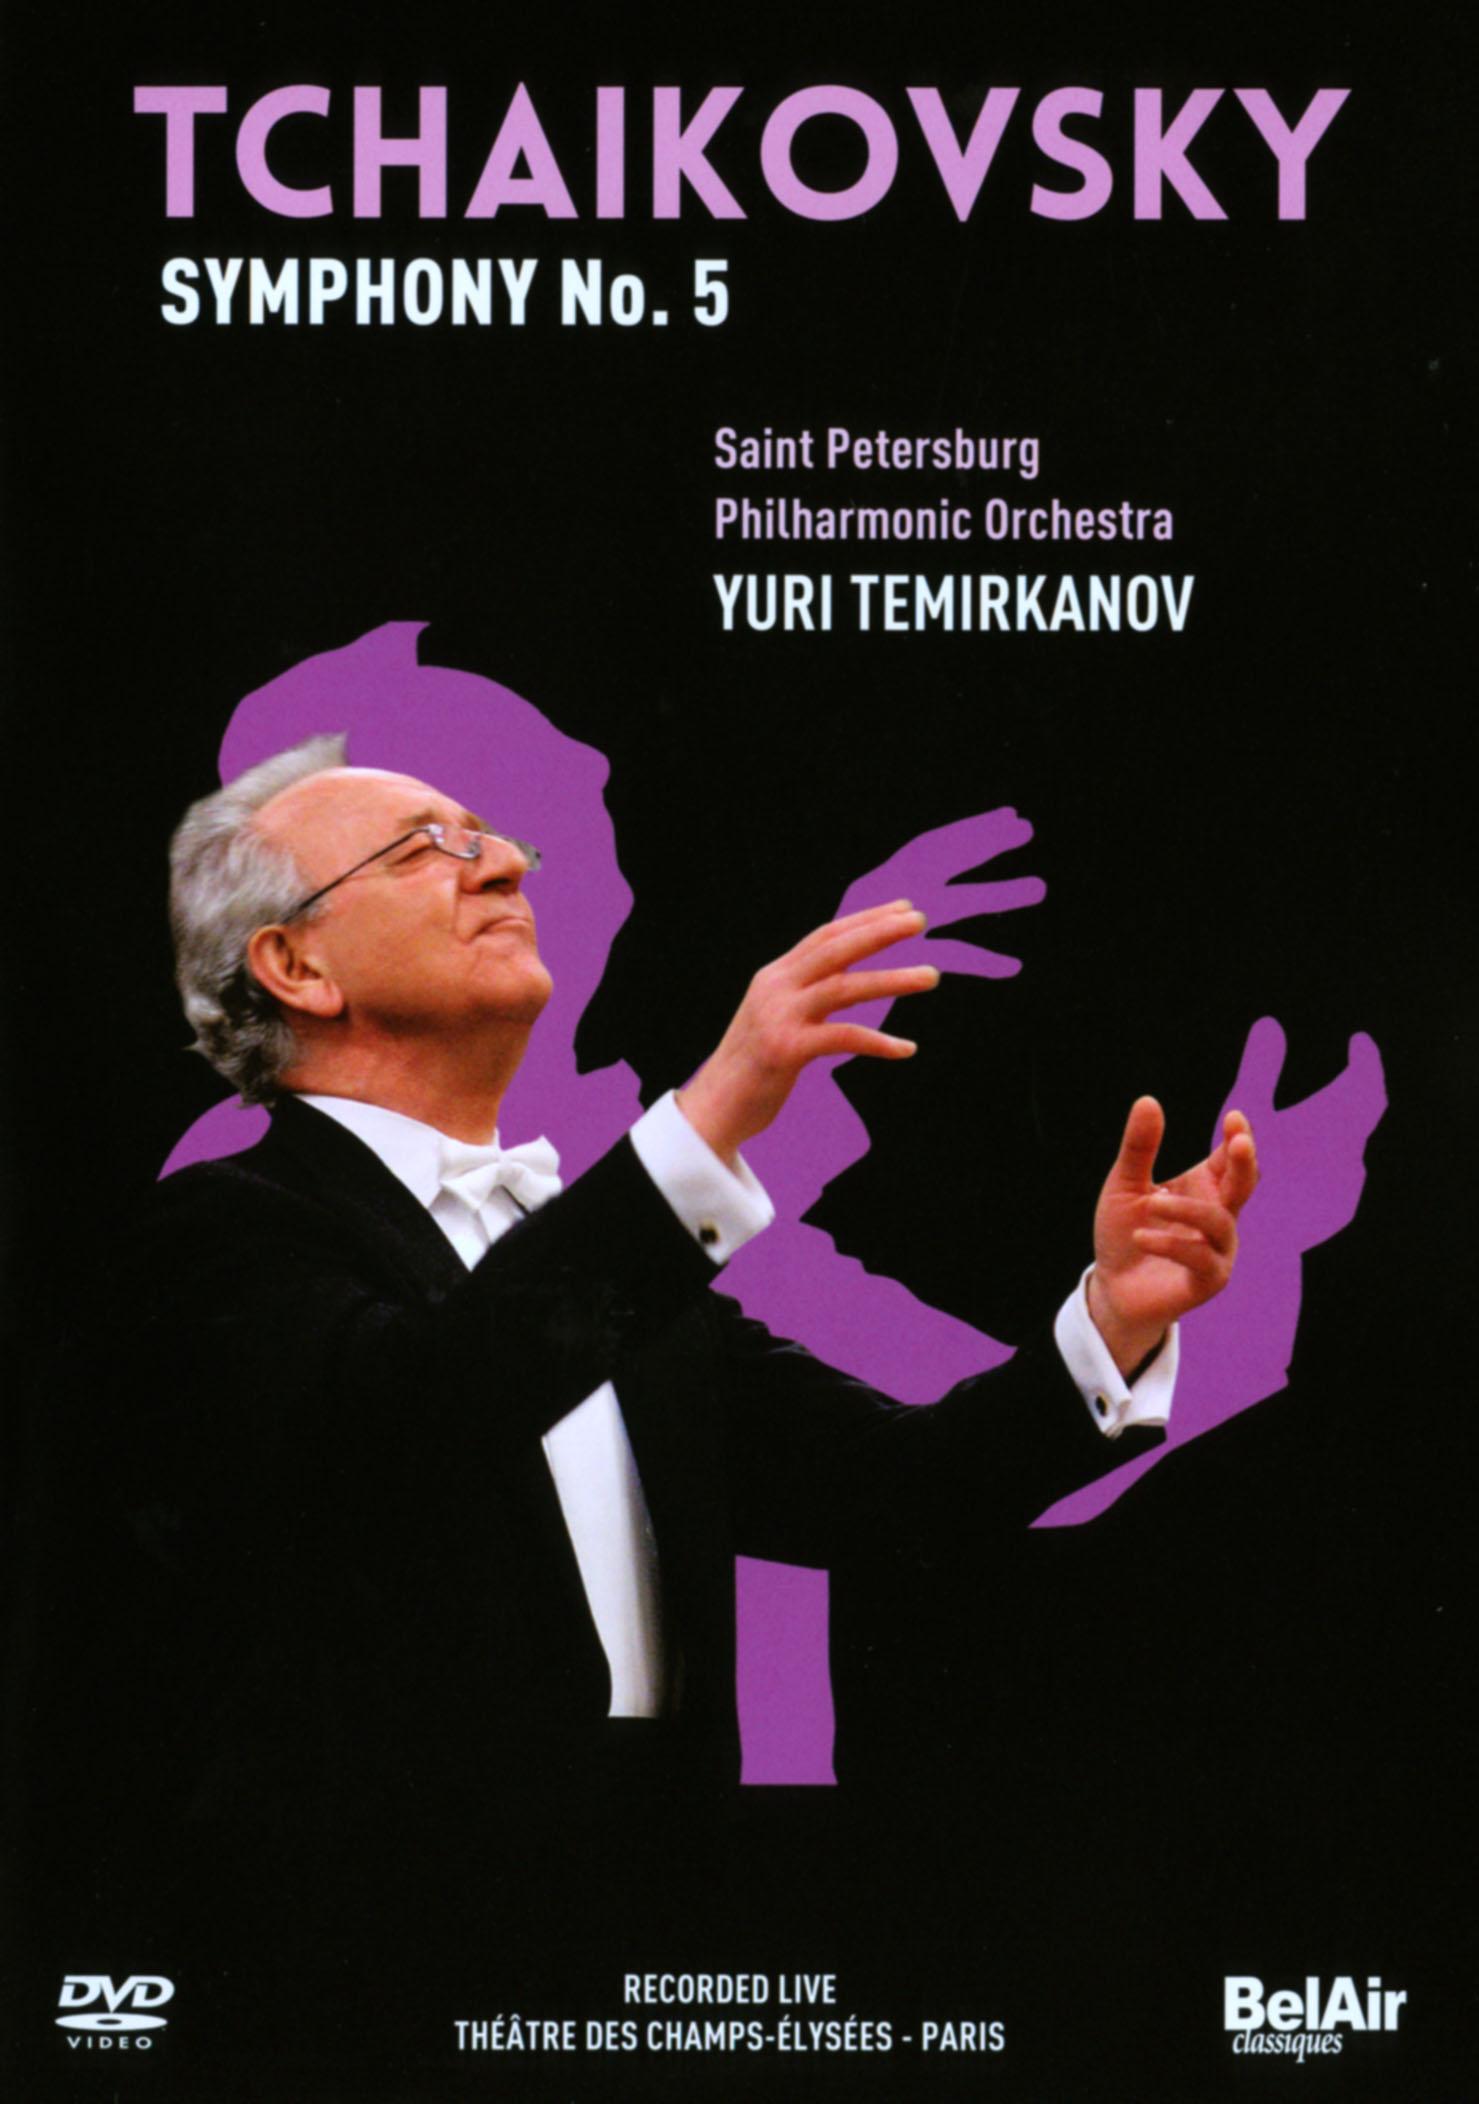 Saint Petersburg Philharmonic Orchestra/Yuri Temirkanov: Tchaikovsky - Symphony No. 5